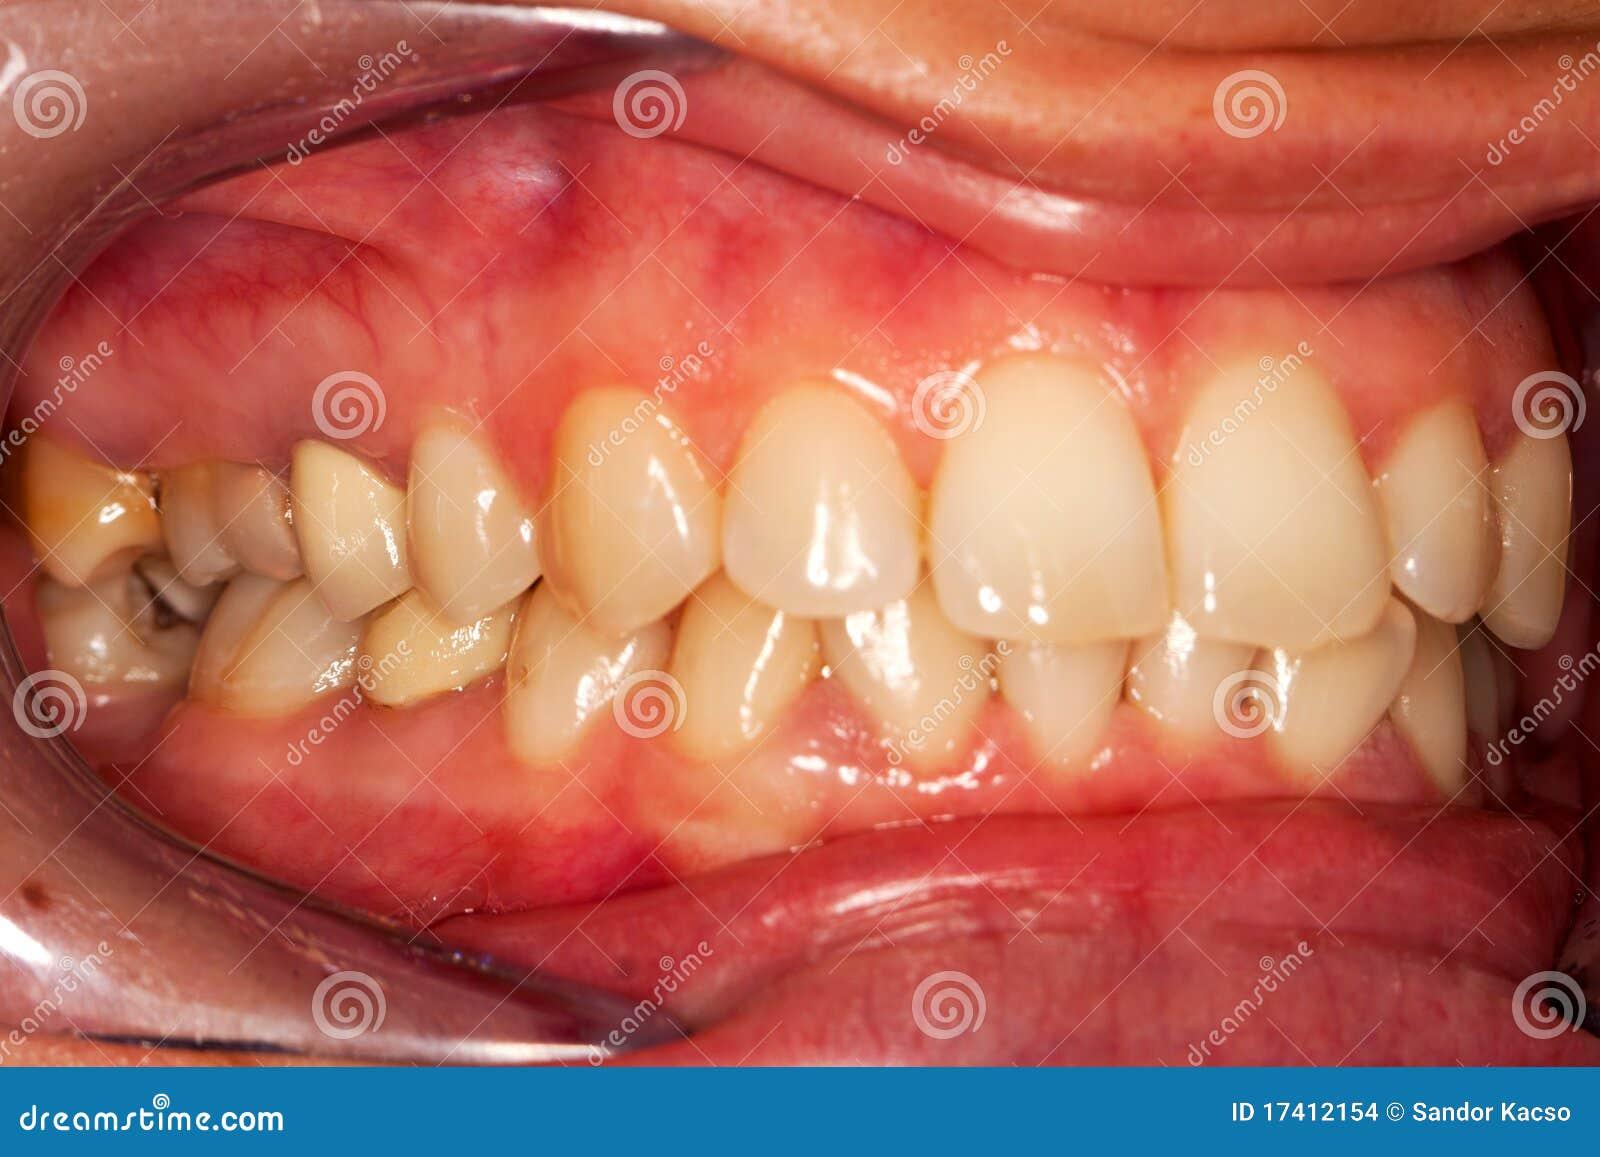 Human Teeth Stock Photo Image Of Health Open Gingivitis 17412154